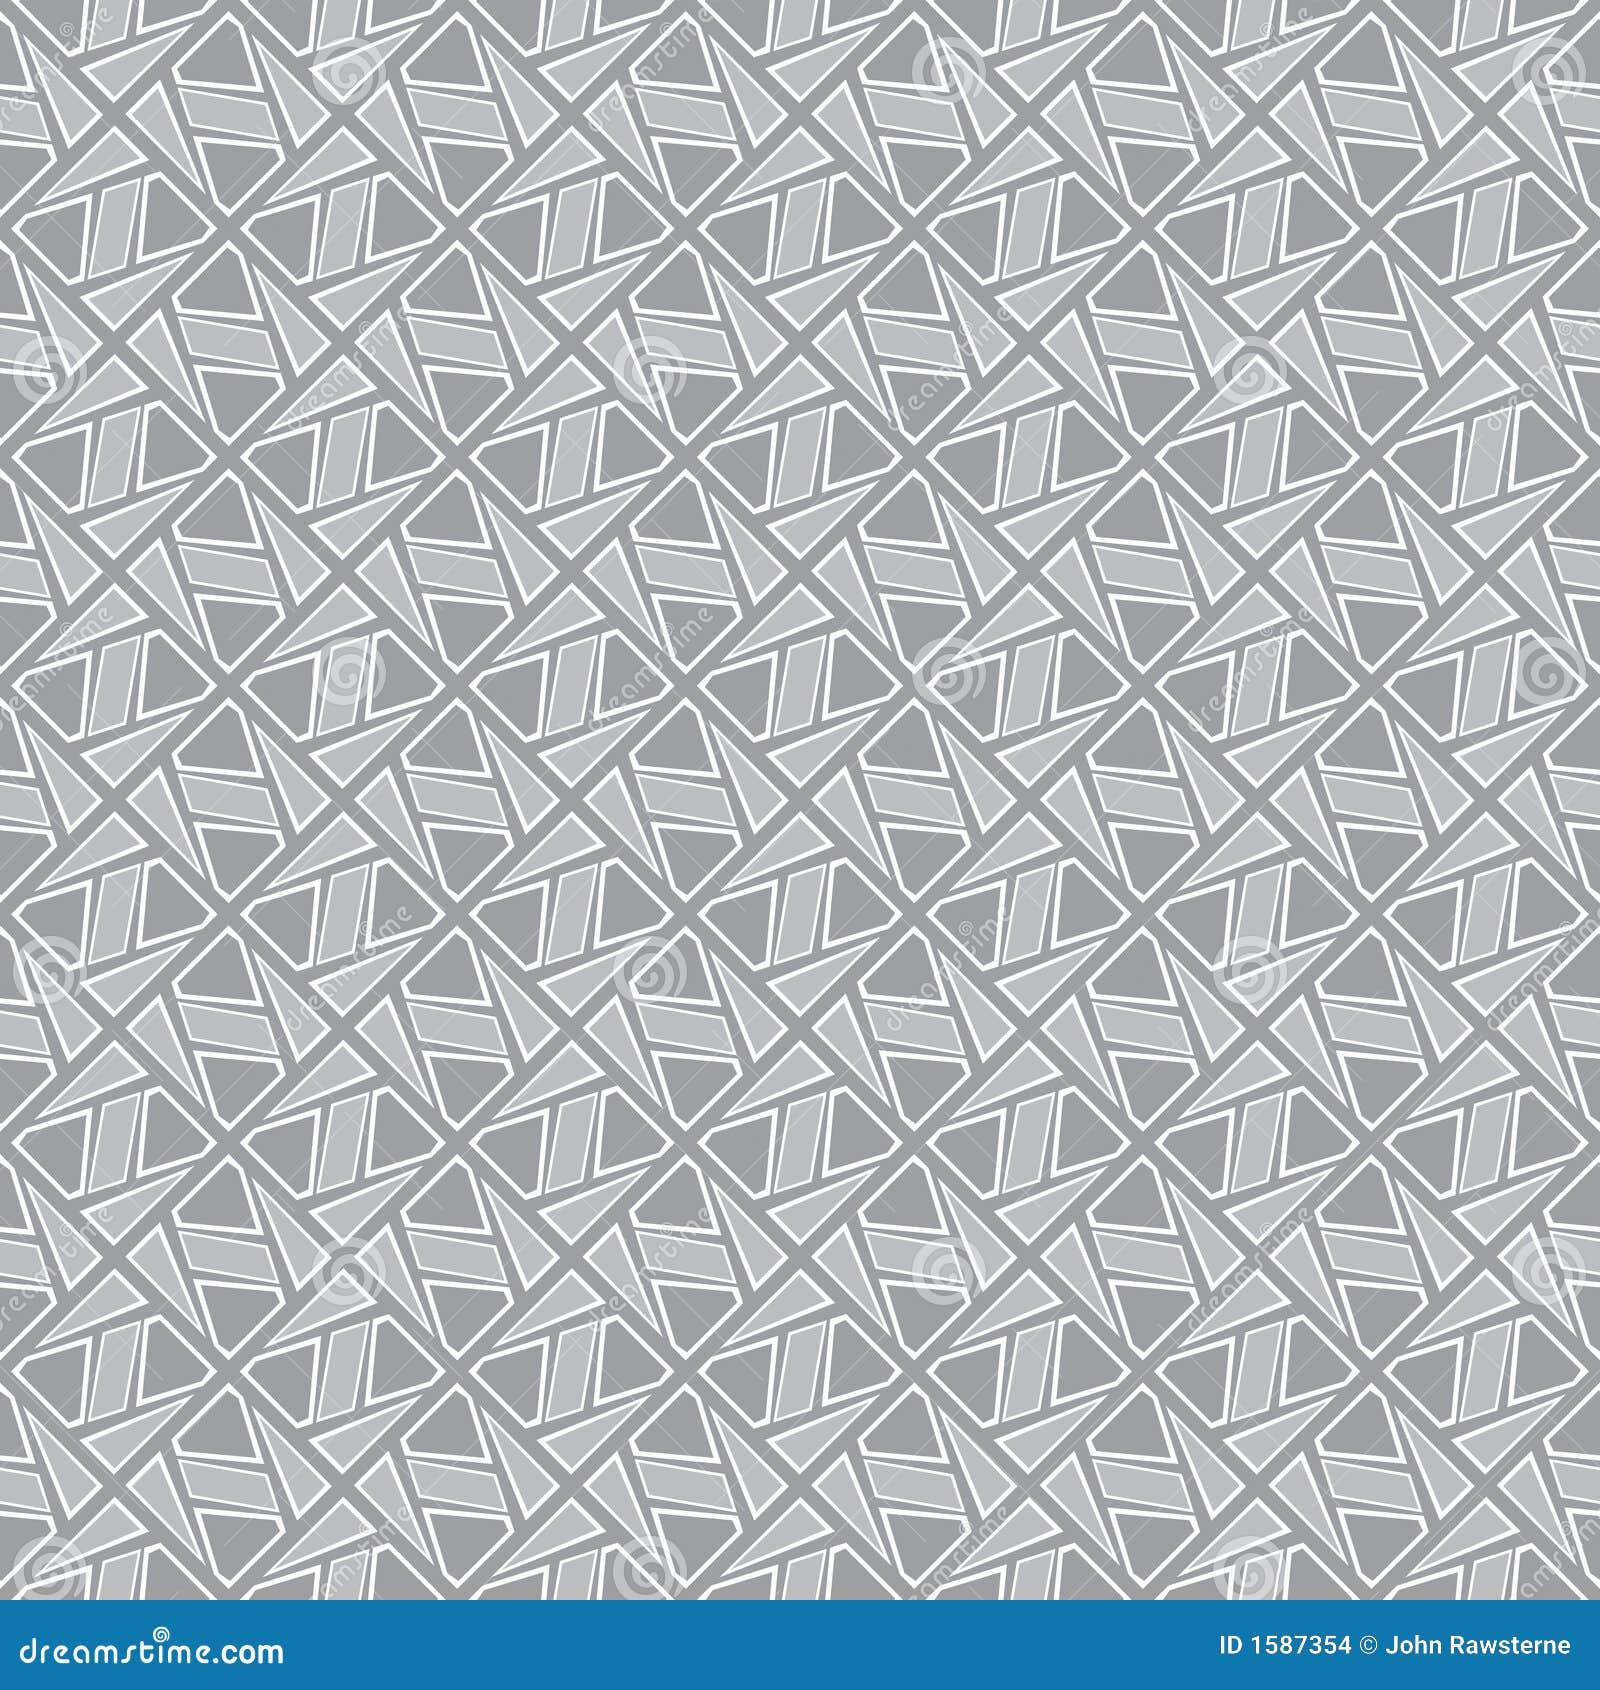 abstraktes nahtloses tapeten muster stock abbildung illustration von wiederholen grau 1587354. Black Bedroom Furniture Sets. Home Design Ideas